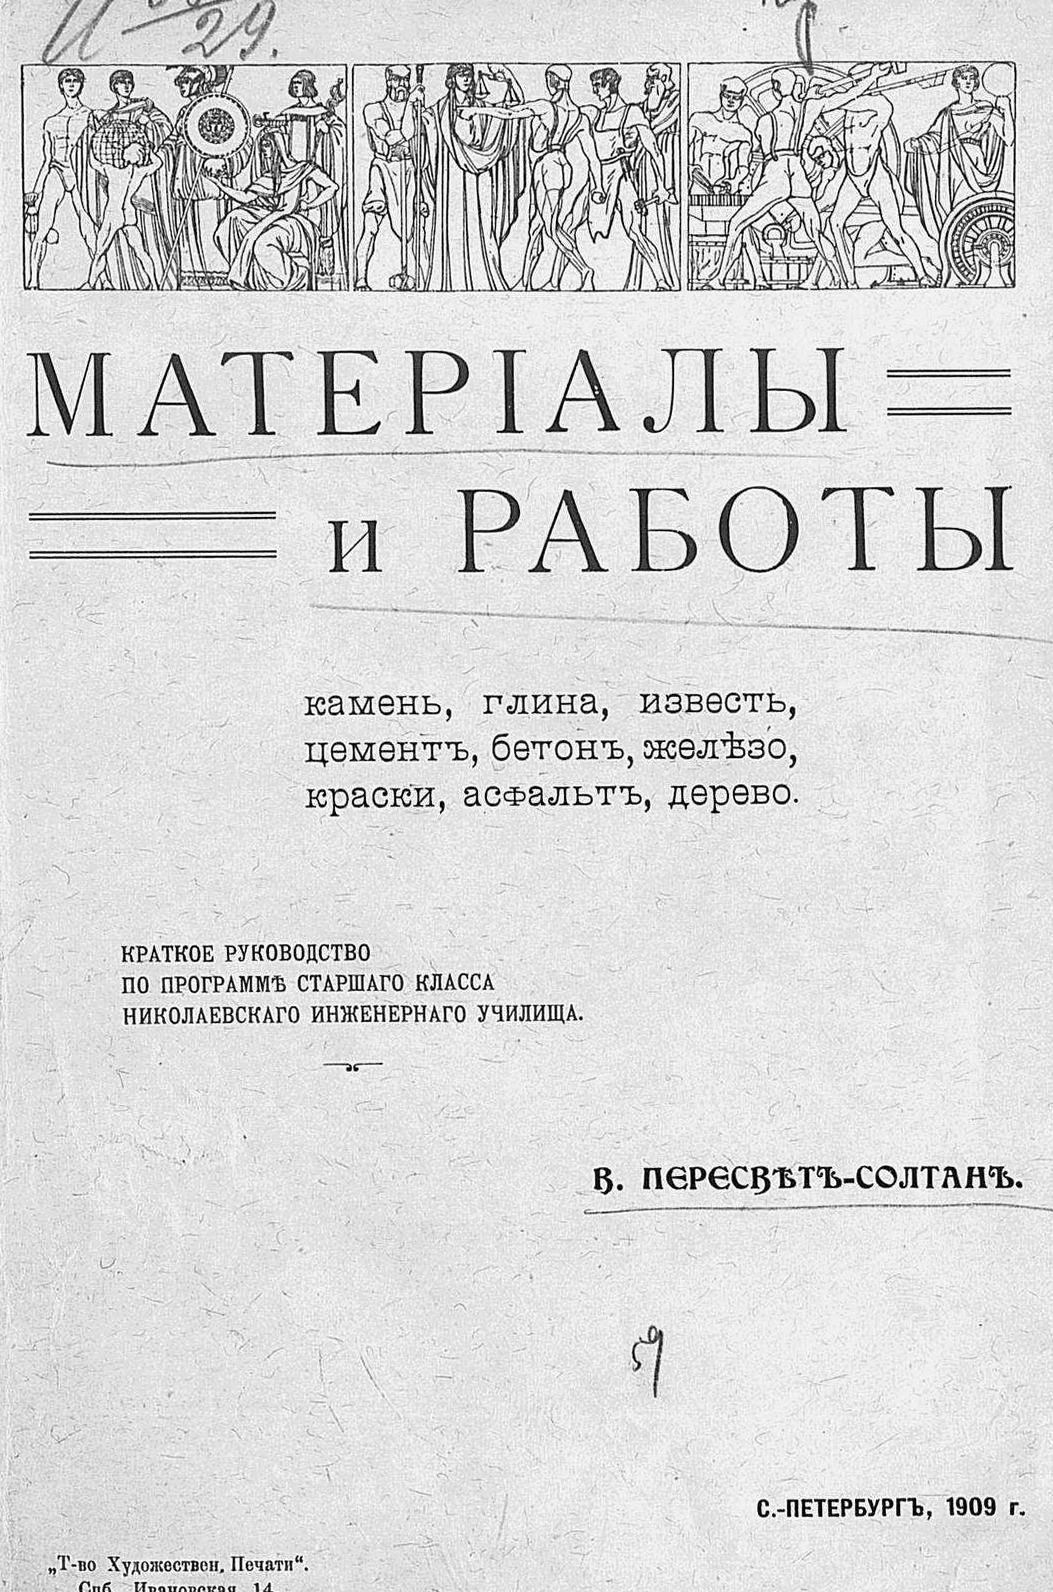 peresvet-soltan-materialy-i-raboty-1909_Page1.jpg